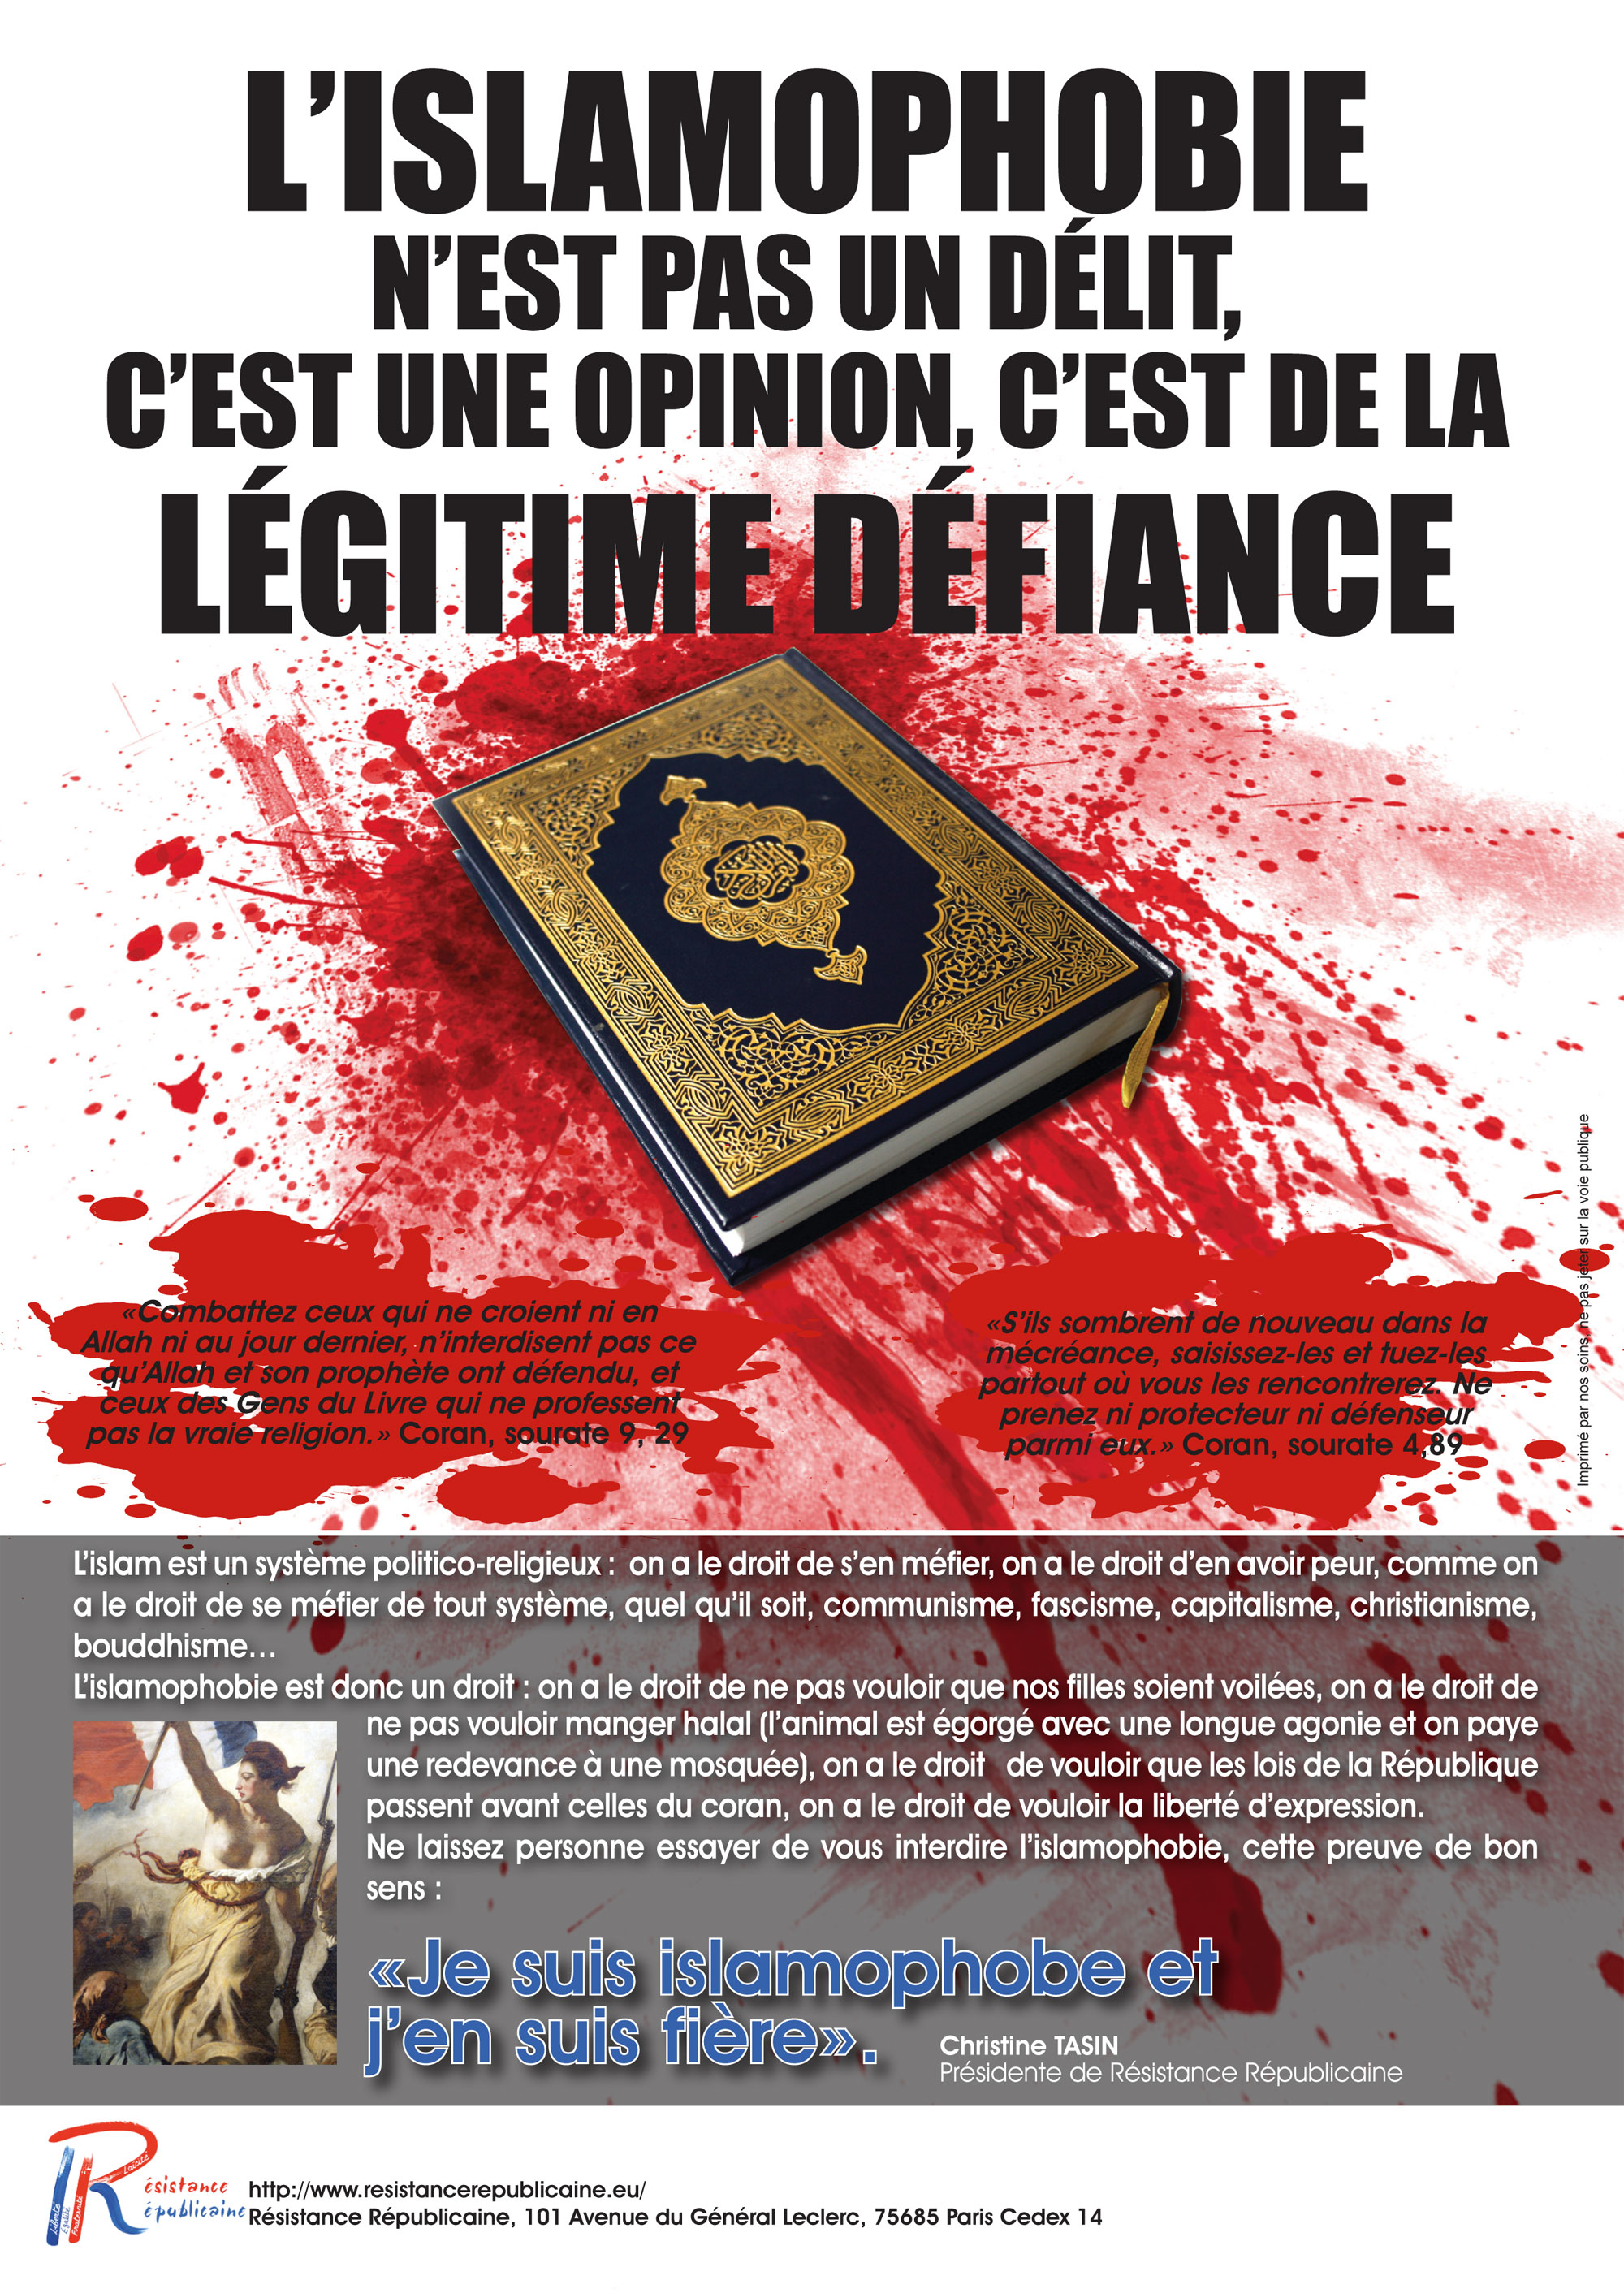 Petite leçon d'islamophobie pour le Figaro et Philippe d'Iribarne…